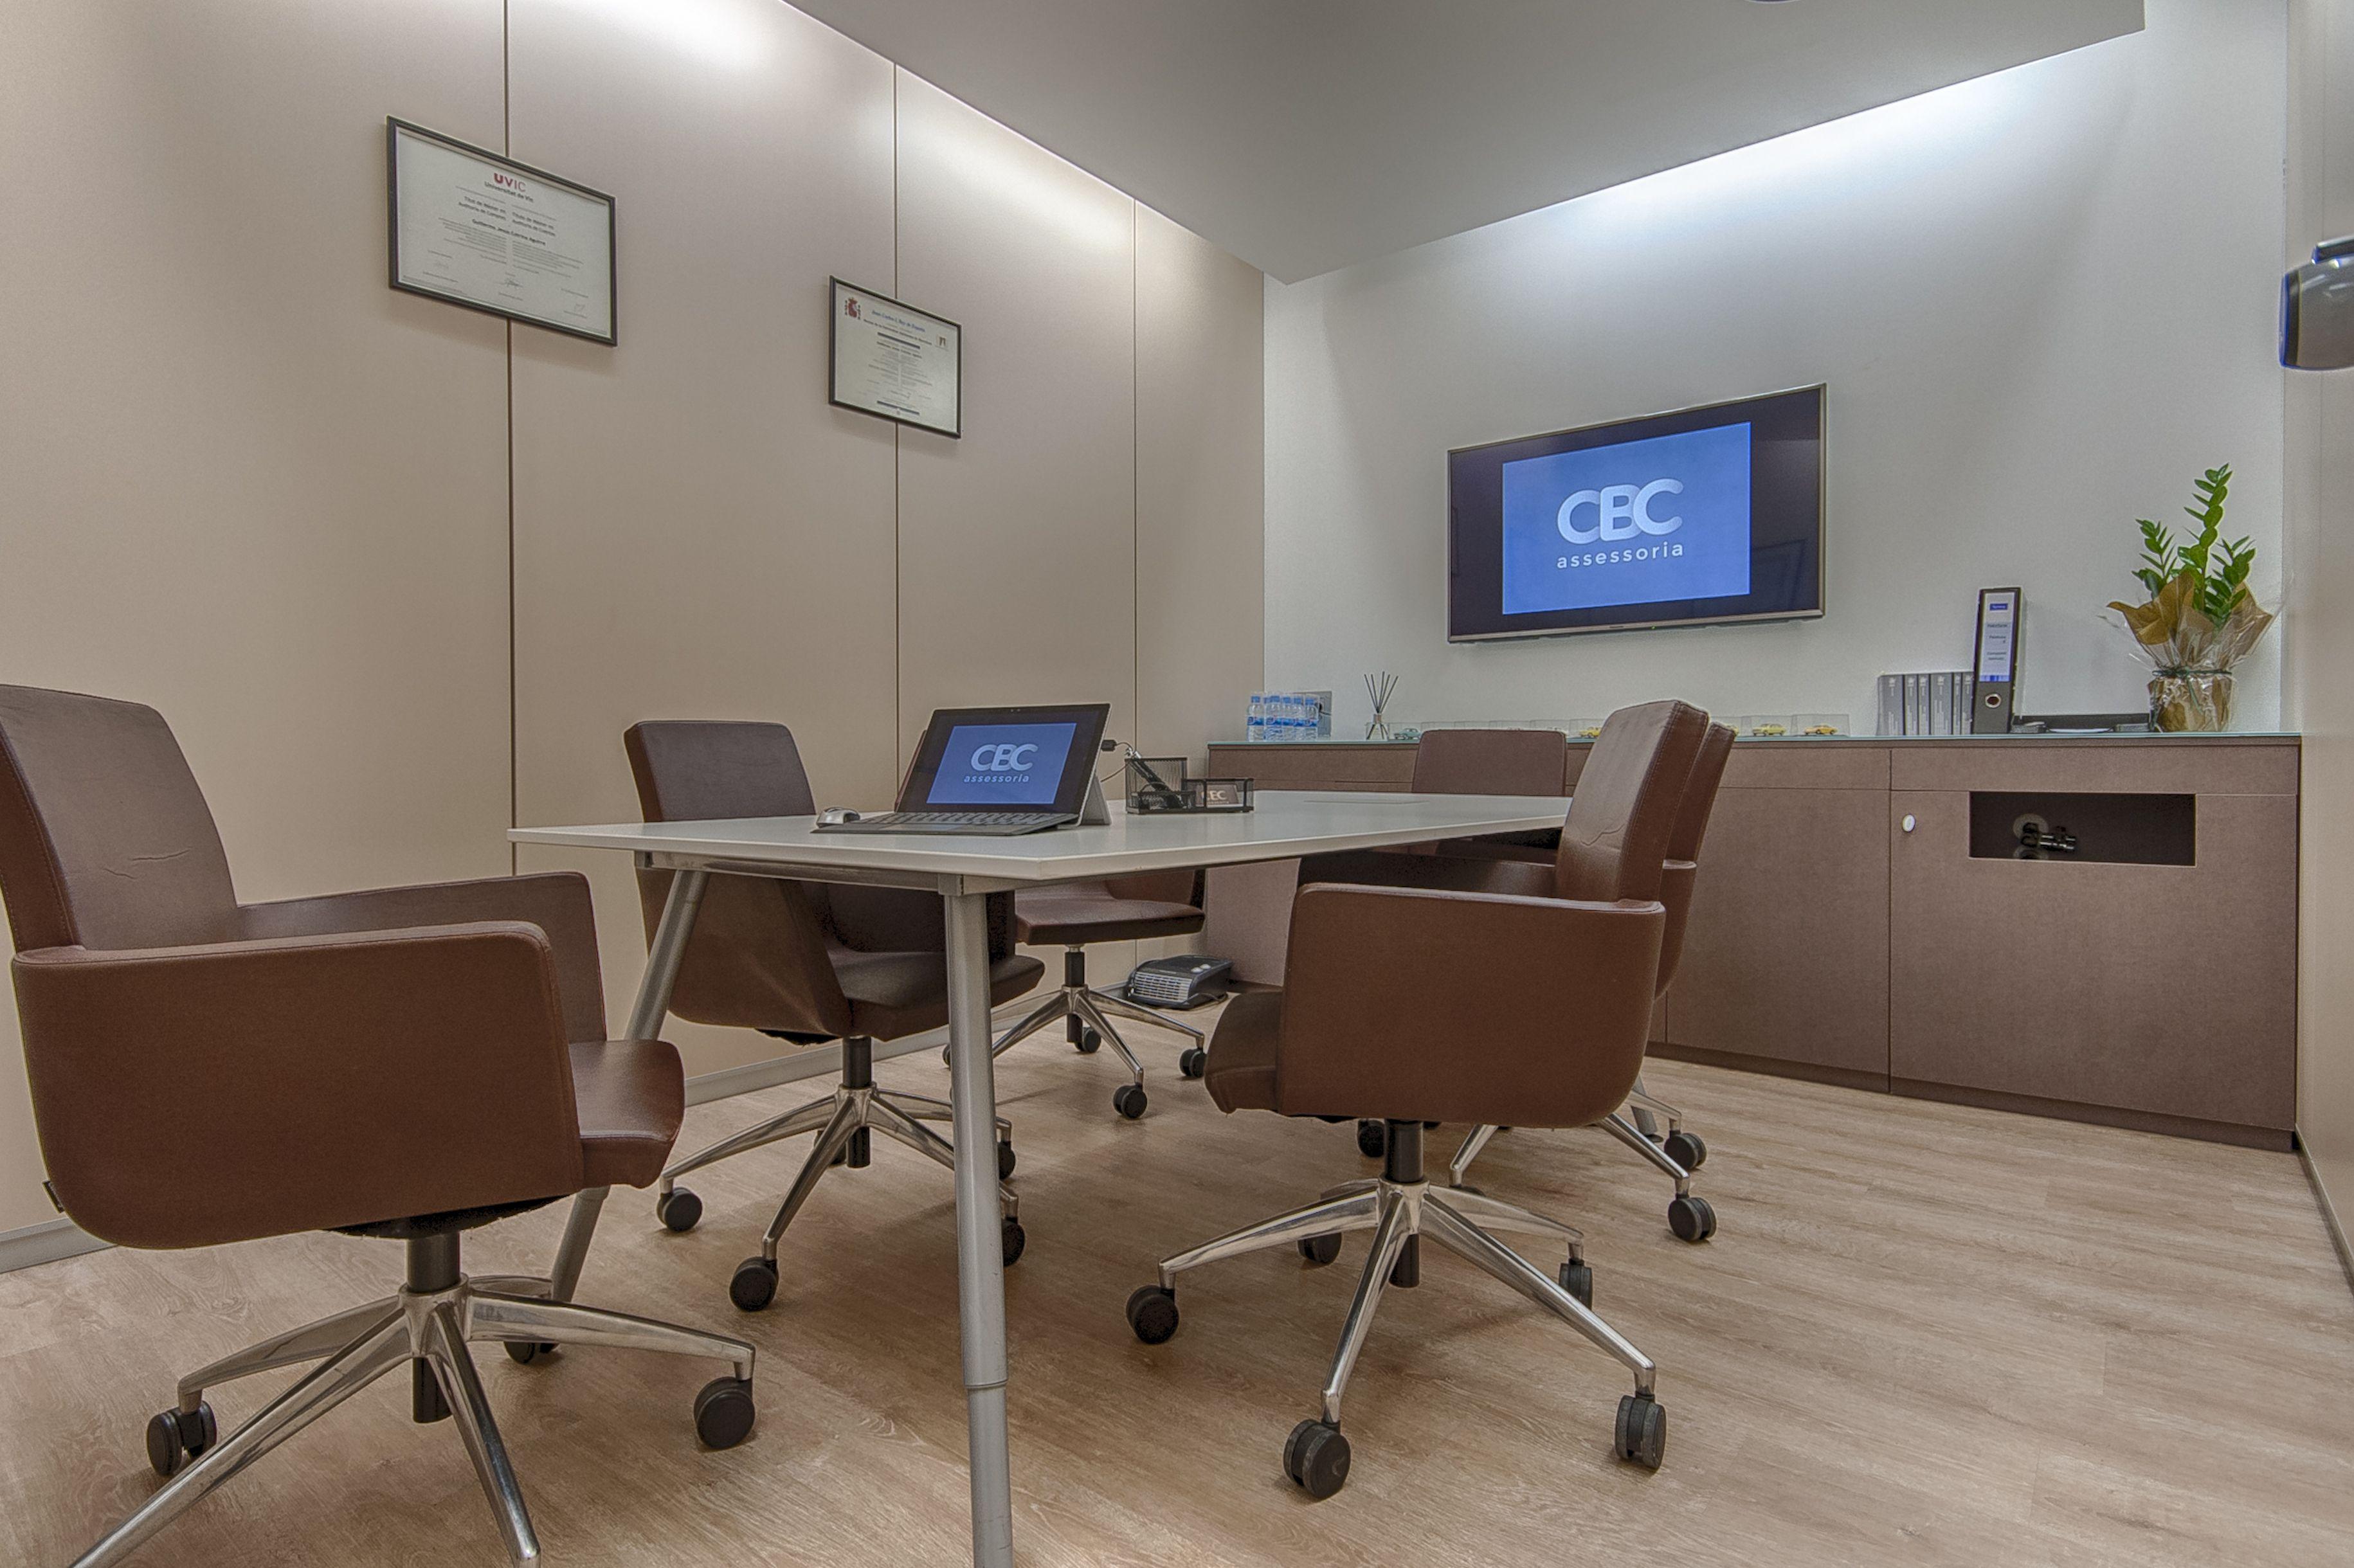 Sala de reunions FOTO: Cedida